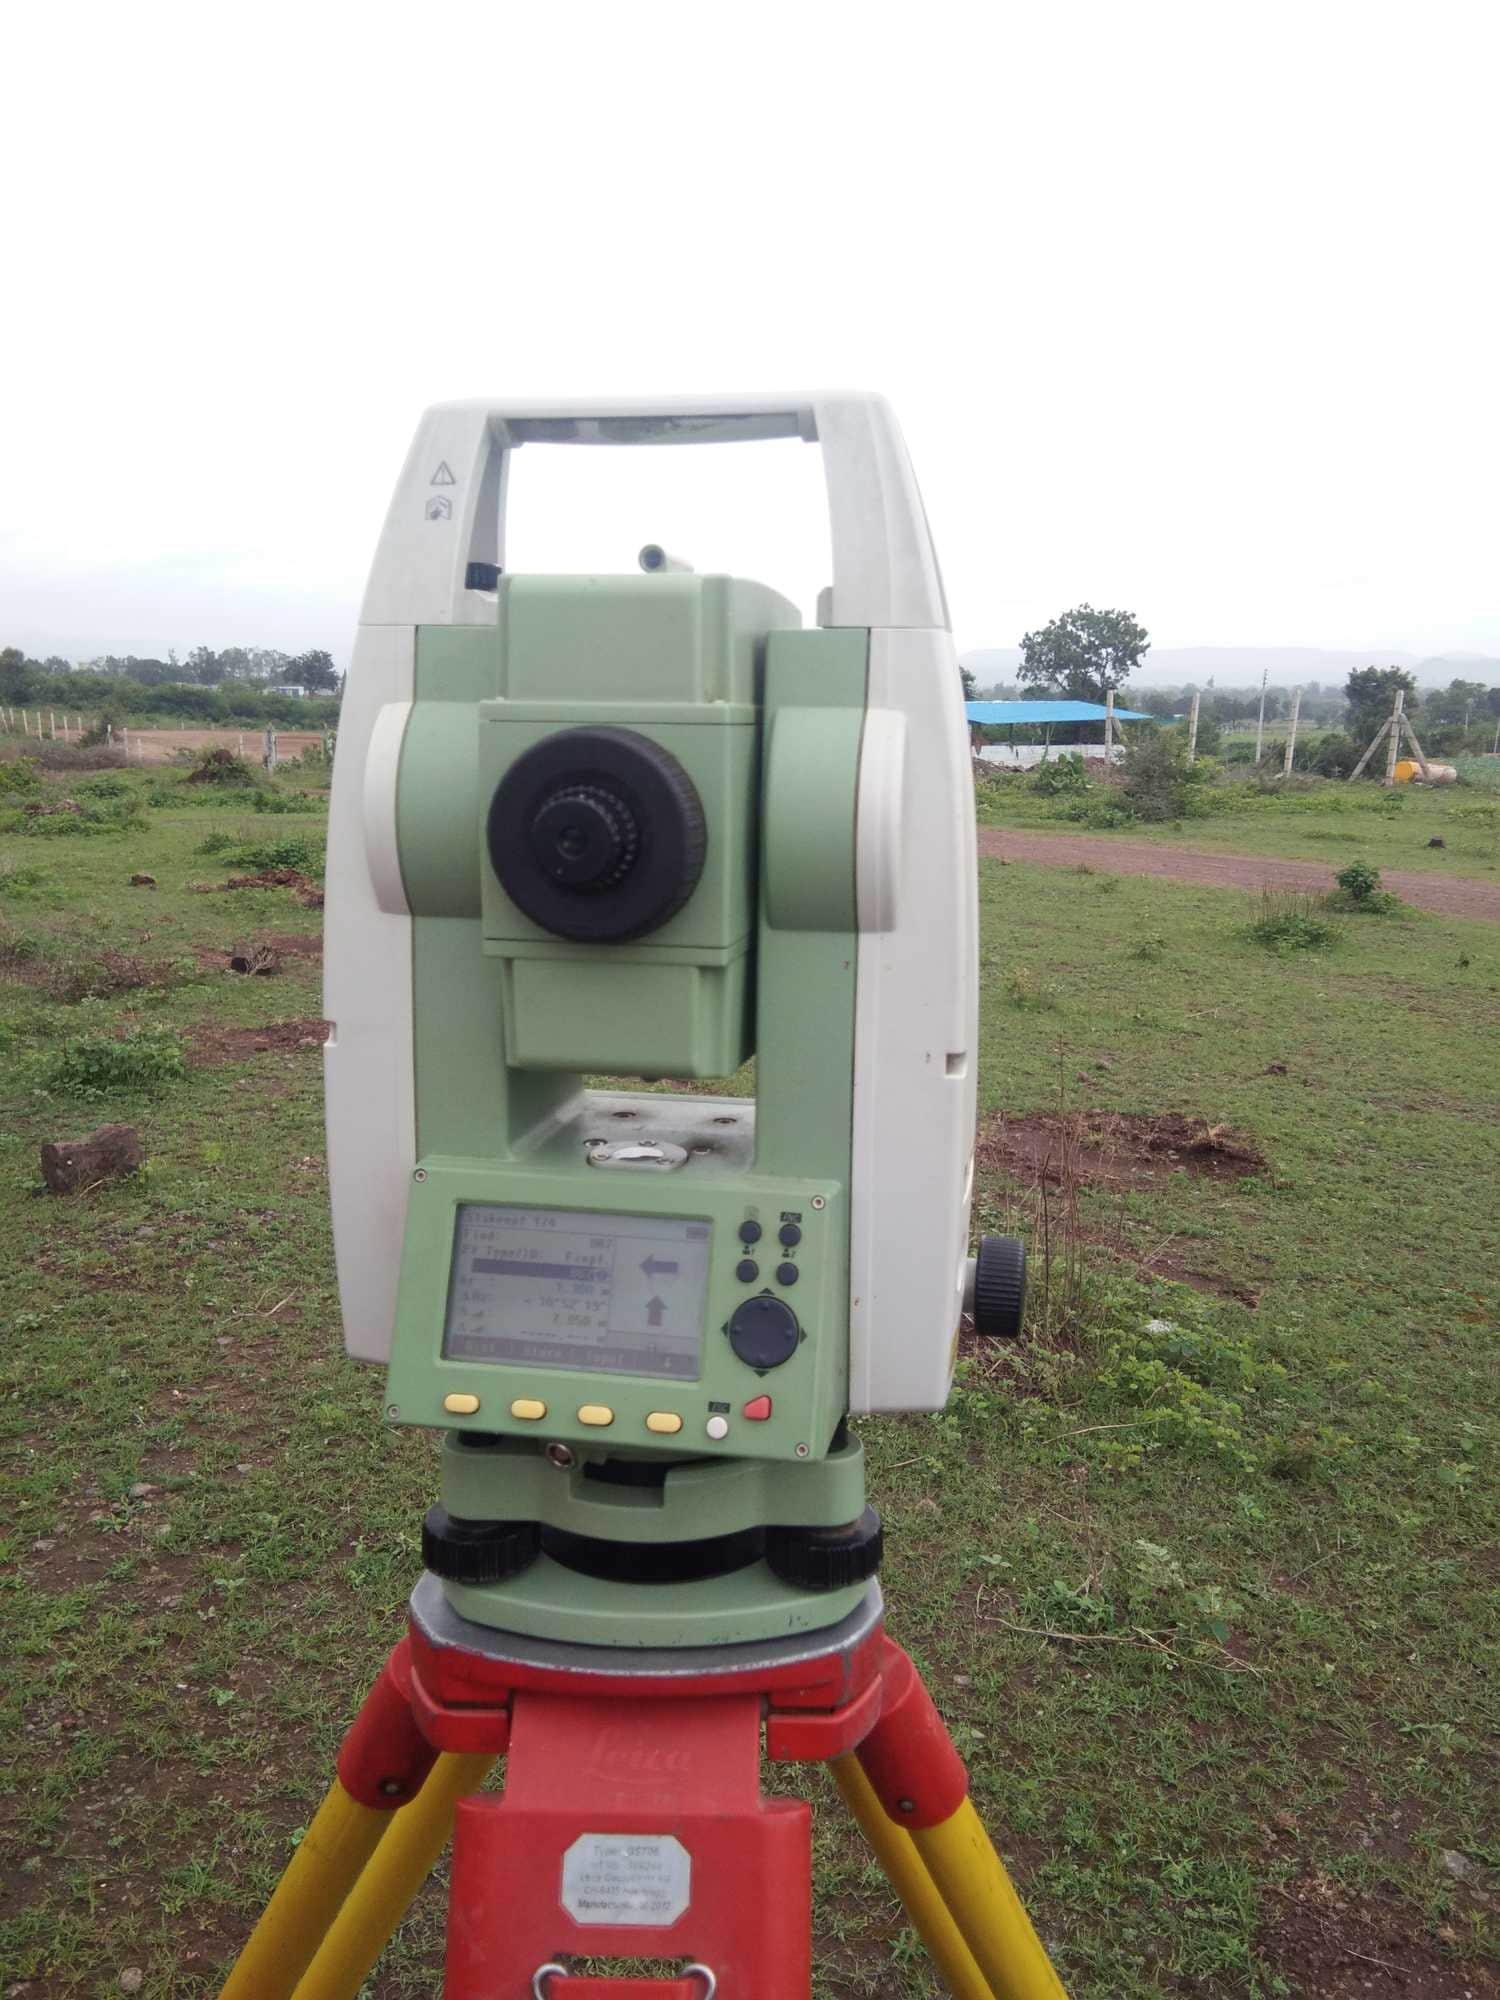 Top Dgps Surveyors in Samarthnagar Aurangabad - Best Differential